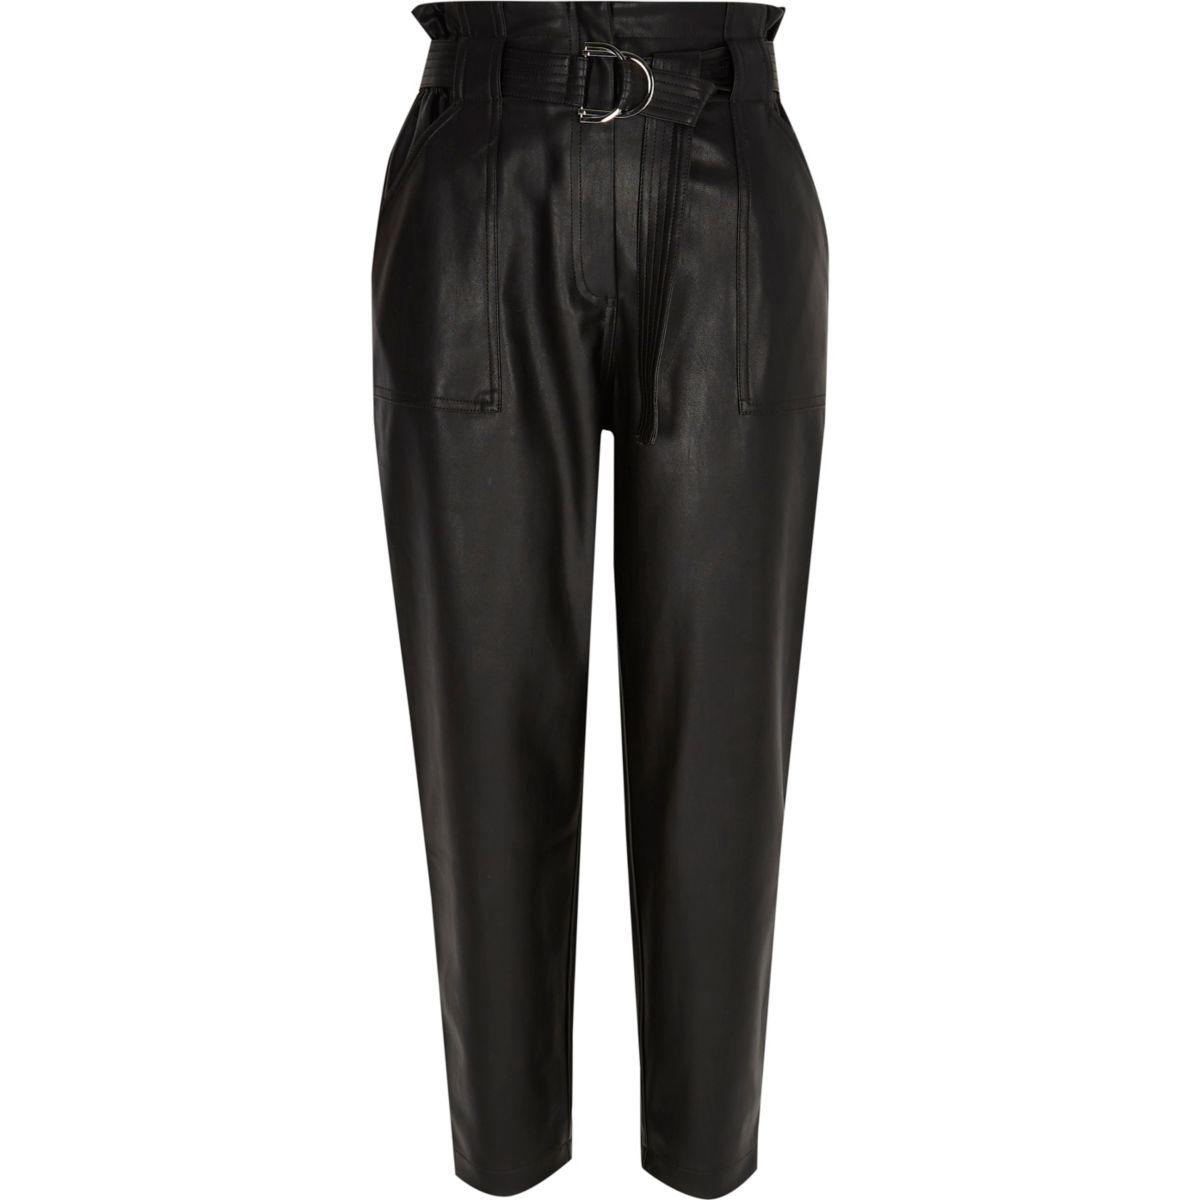 Petite black faux leather paperbag pants